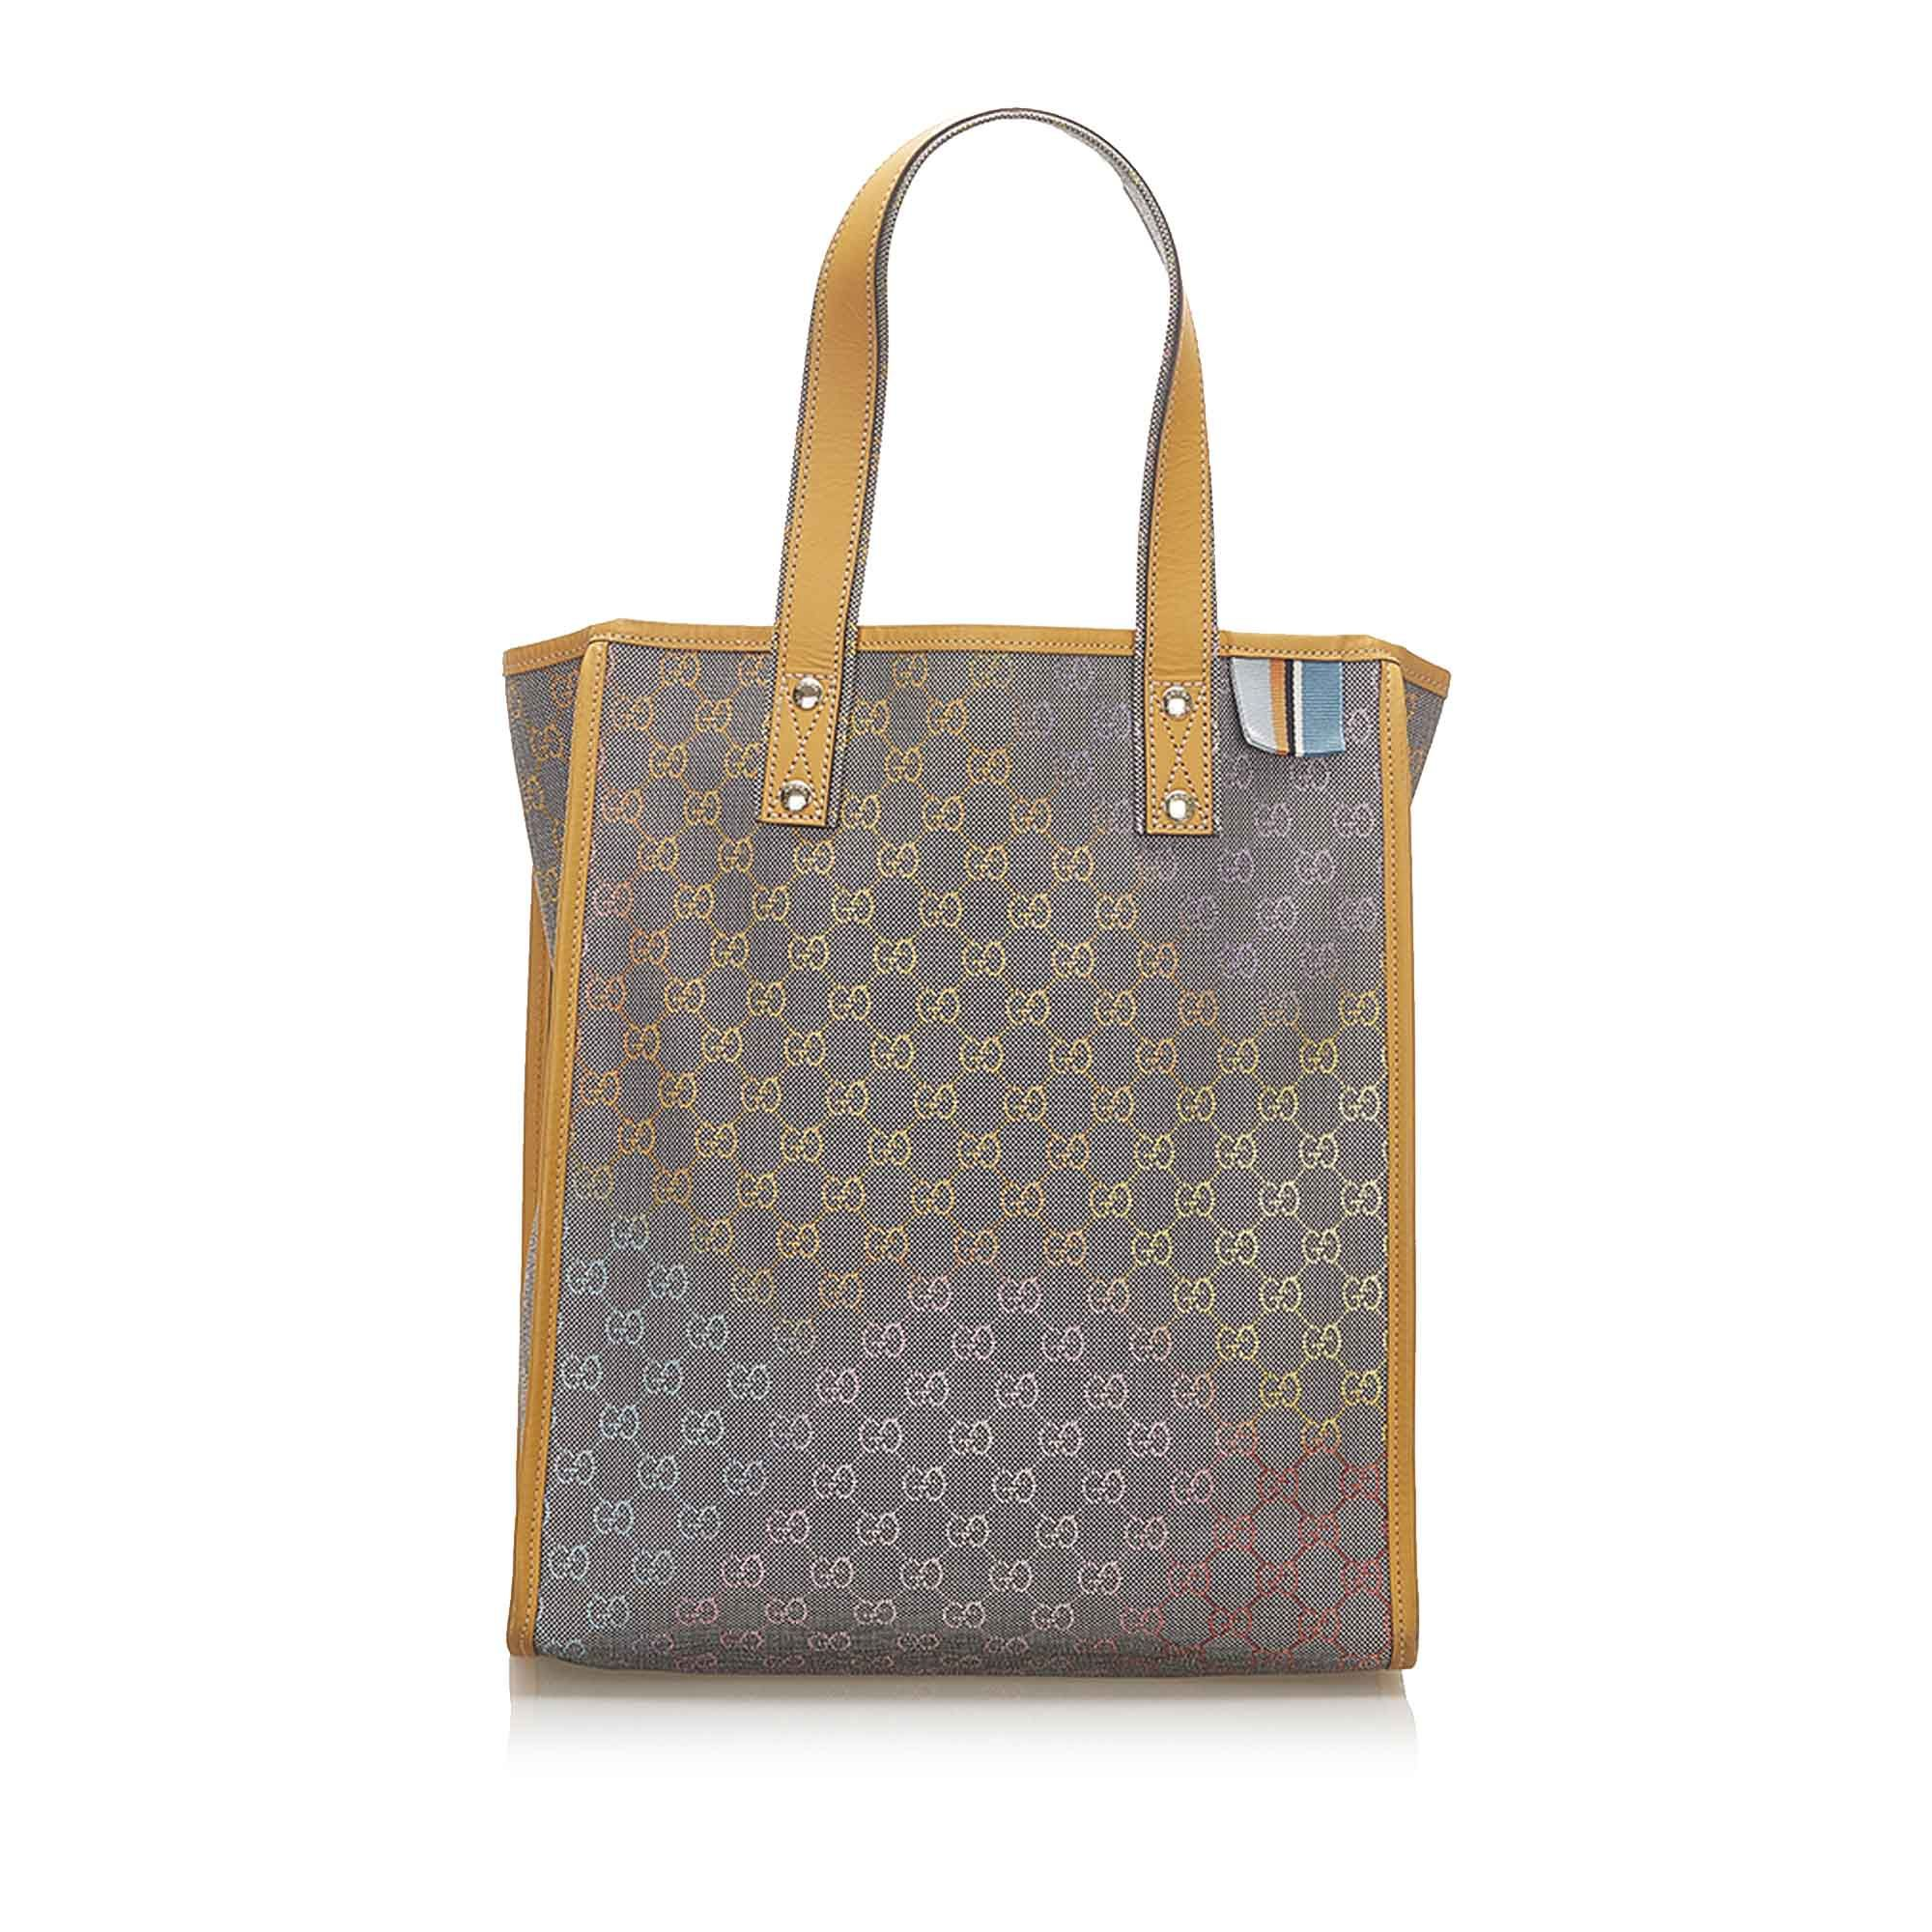 Vintage Gucci GG Denim Web Loop Tote Bag Gray